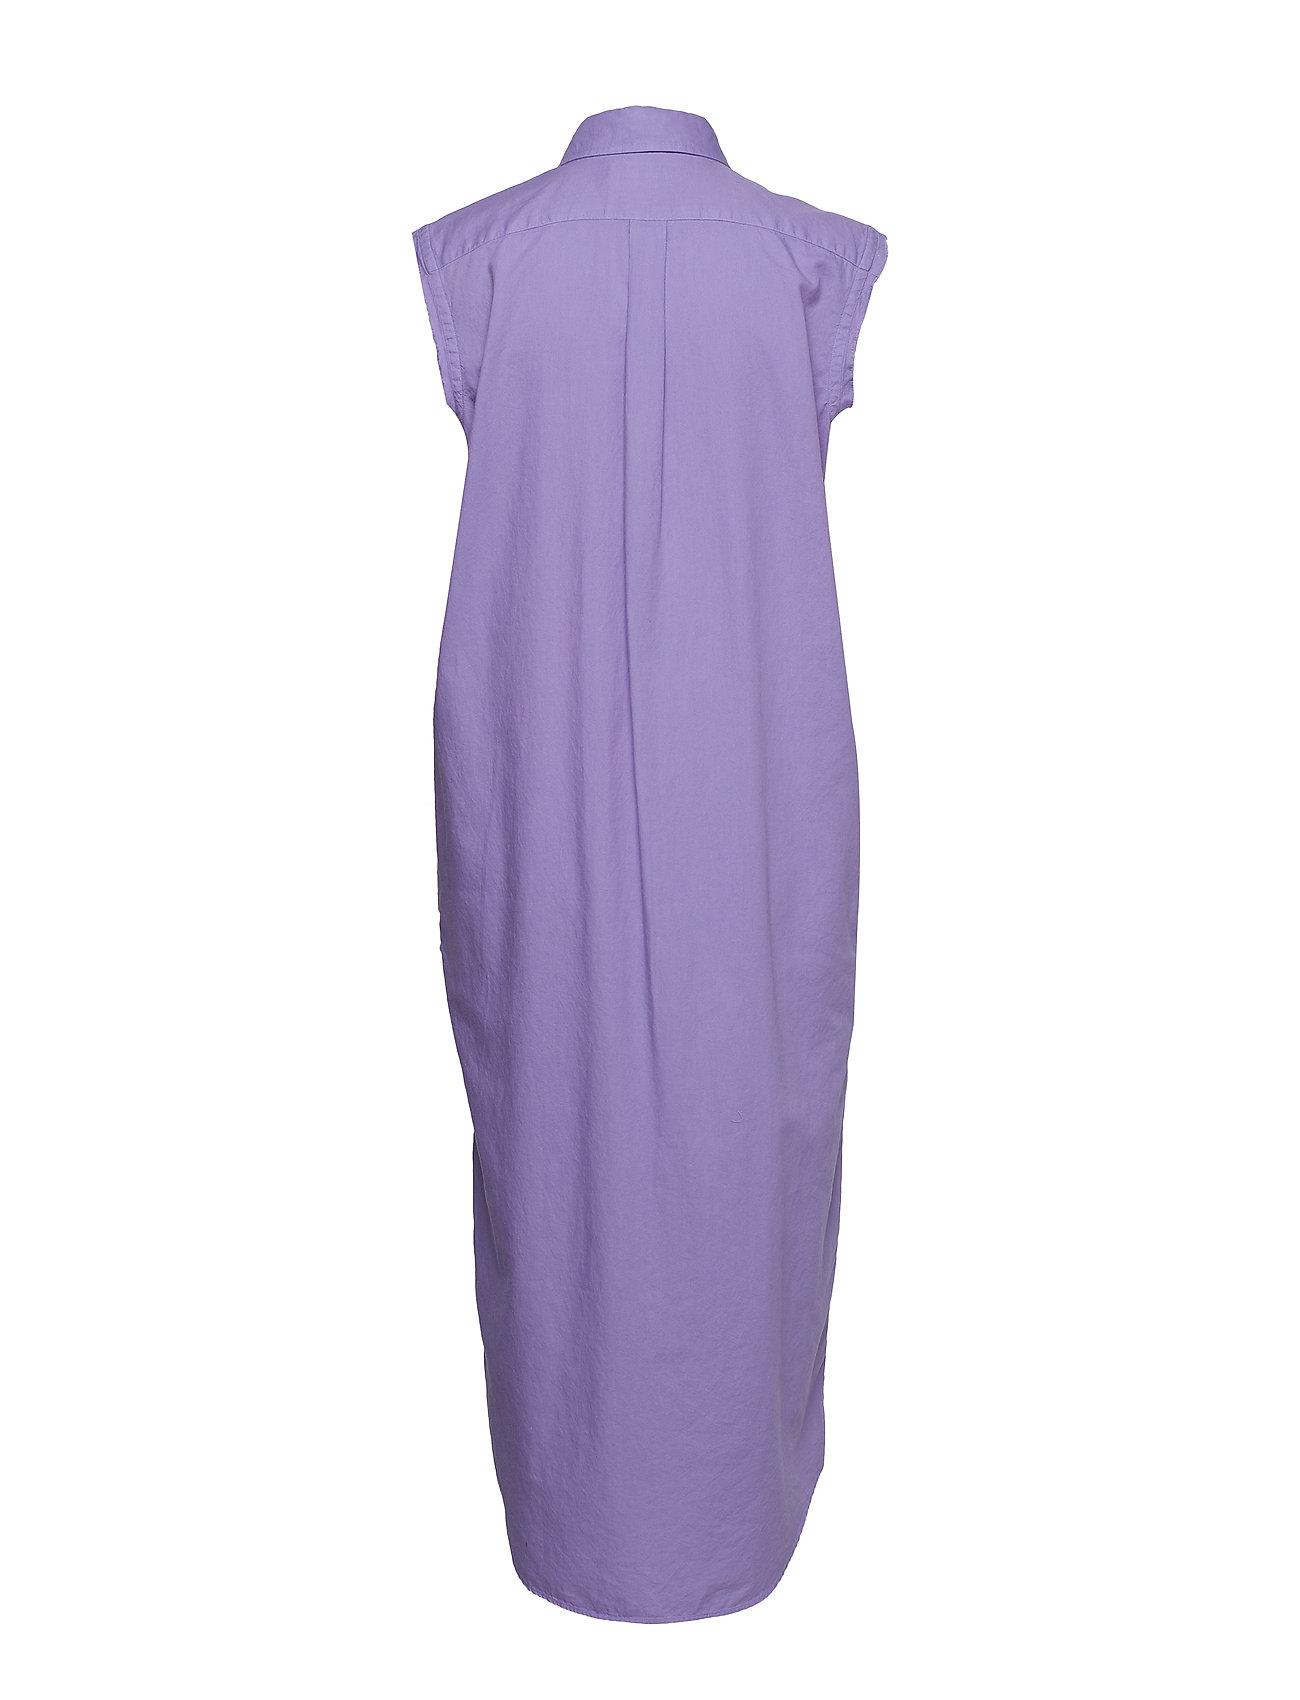 Laundered csdmartin PurplePolo Ralph Lauren sls Oxford zpSUMV